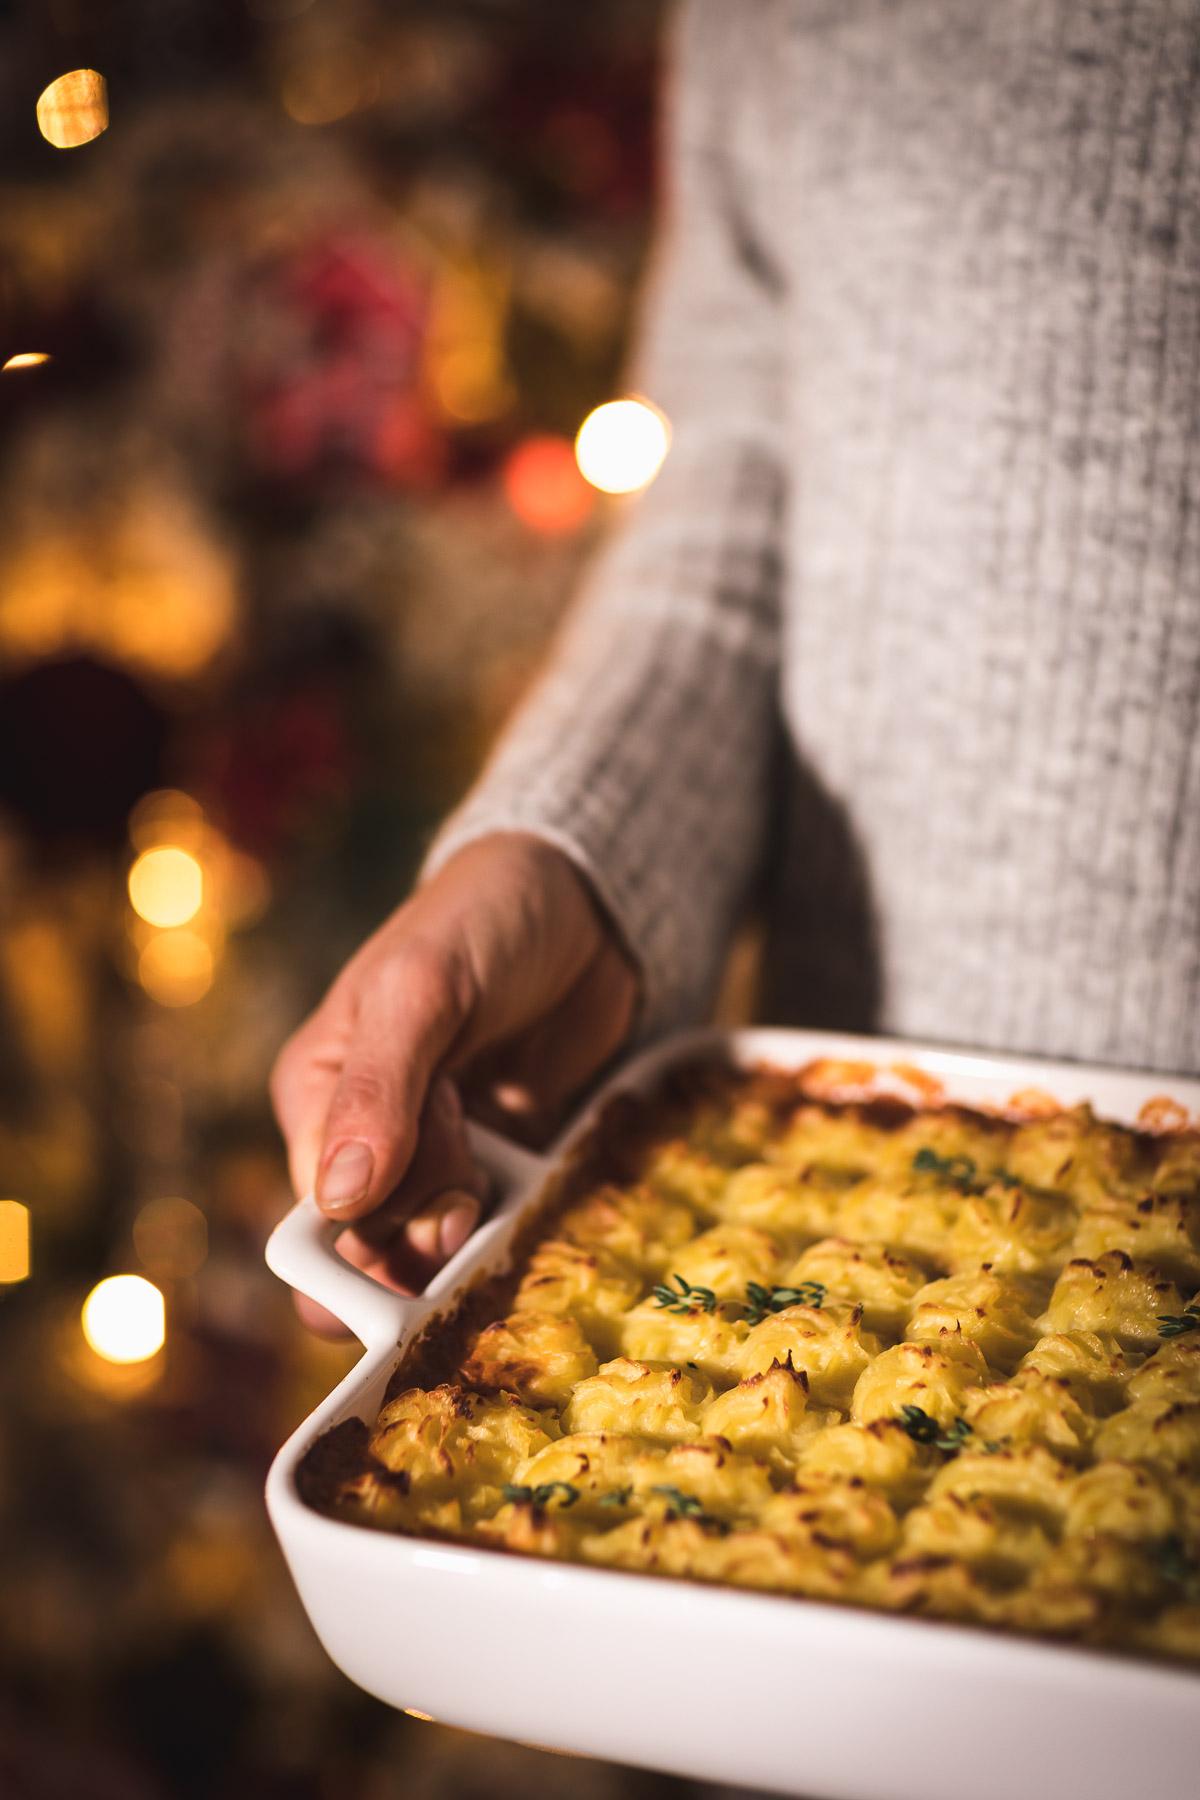 healthy Vegan Lentil Shepherd's Pie recipe cottage pie for Thanksgiving ricetta di Natale Vegan Shepherd's Pie di lenticchie con ragù di lenticchie funghi